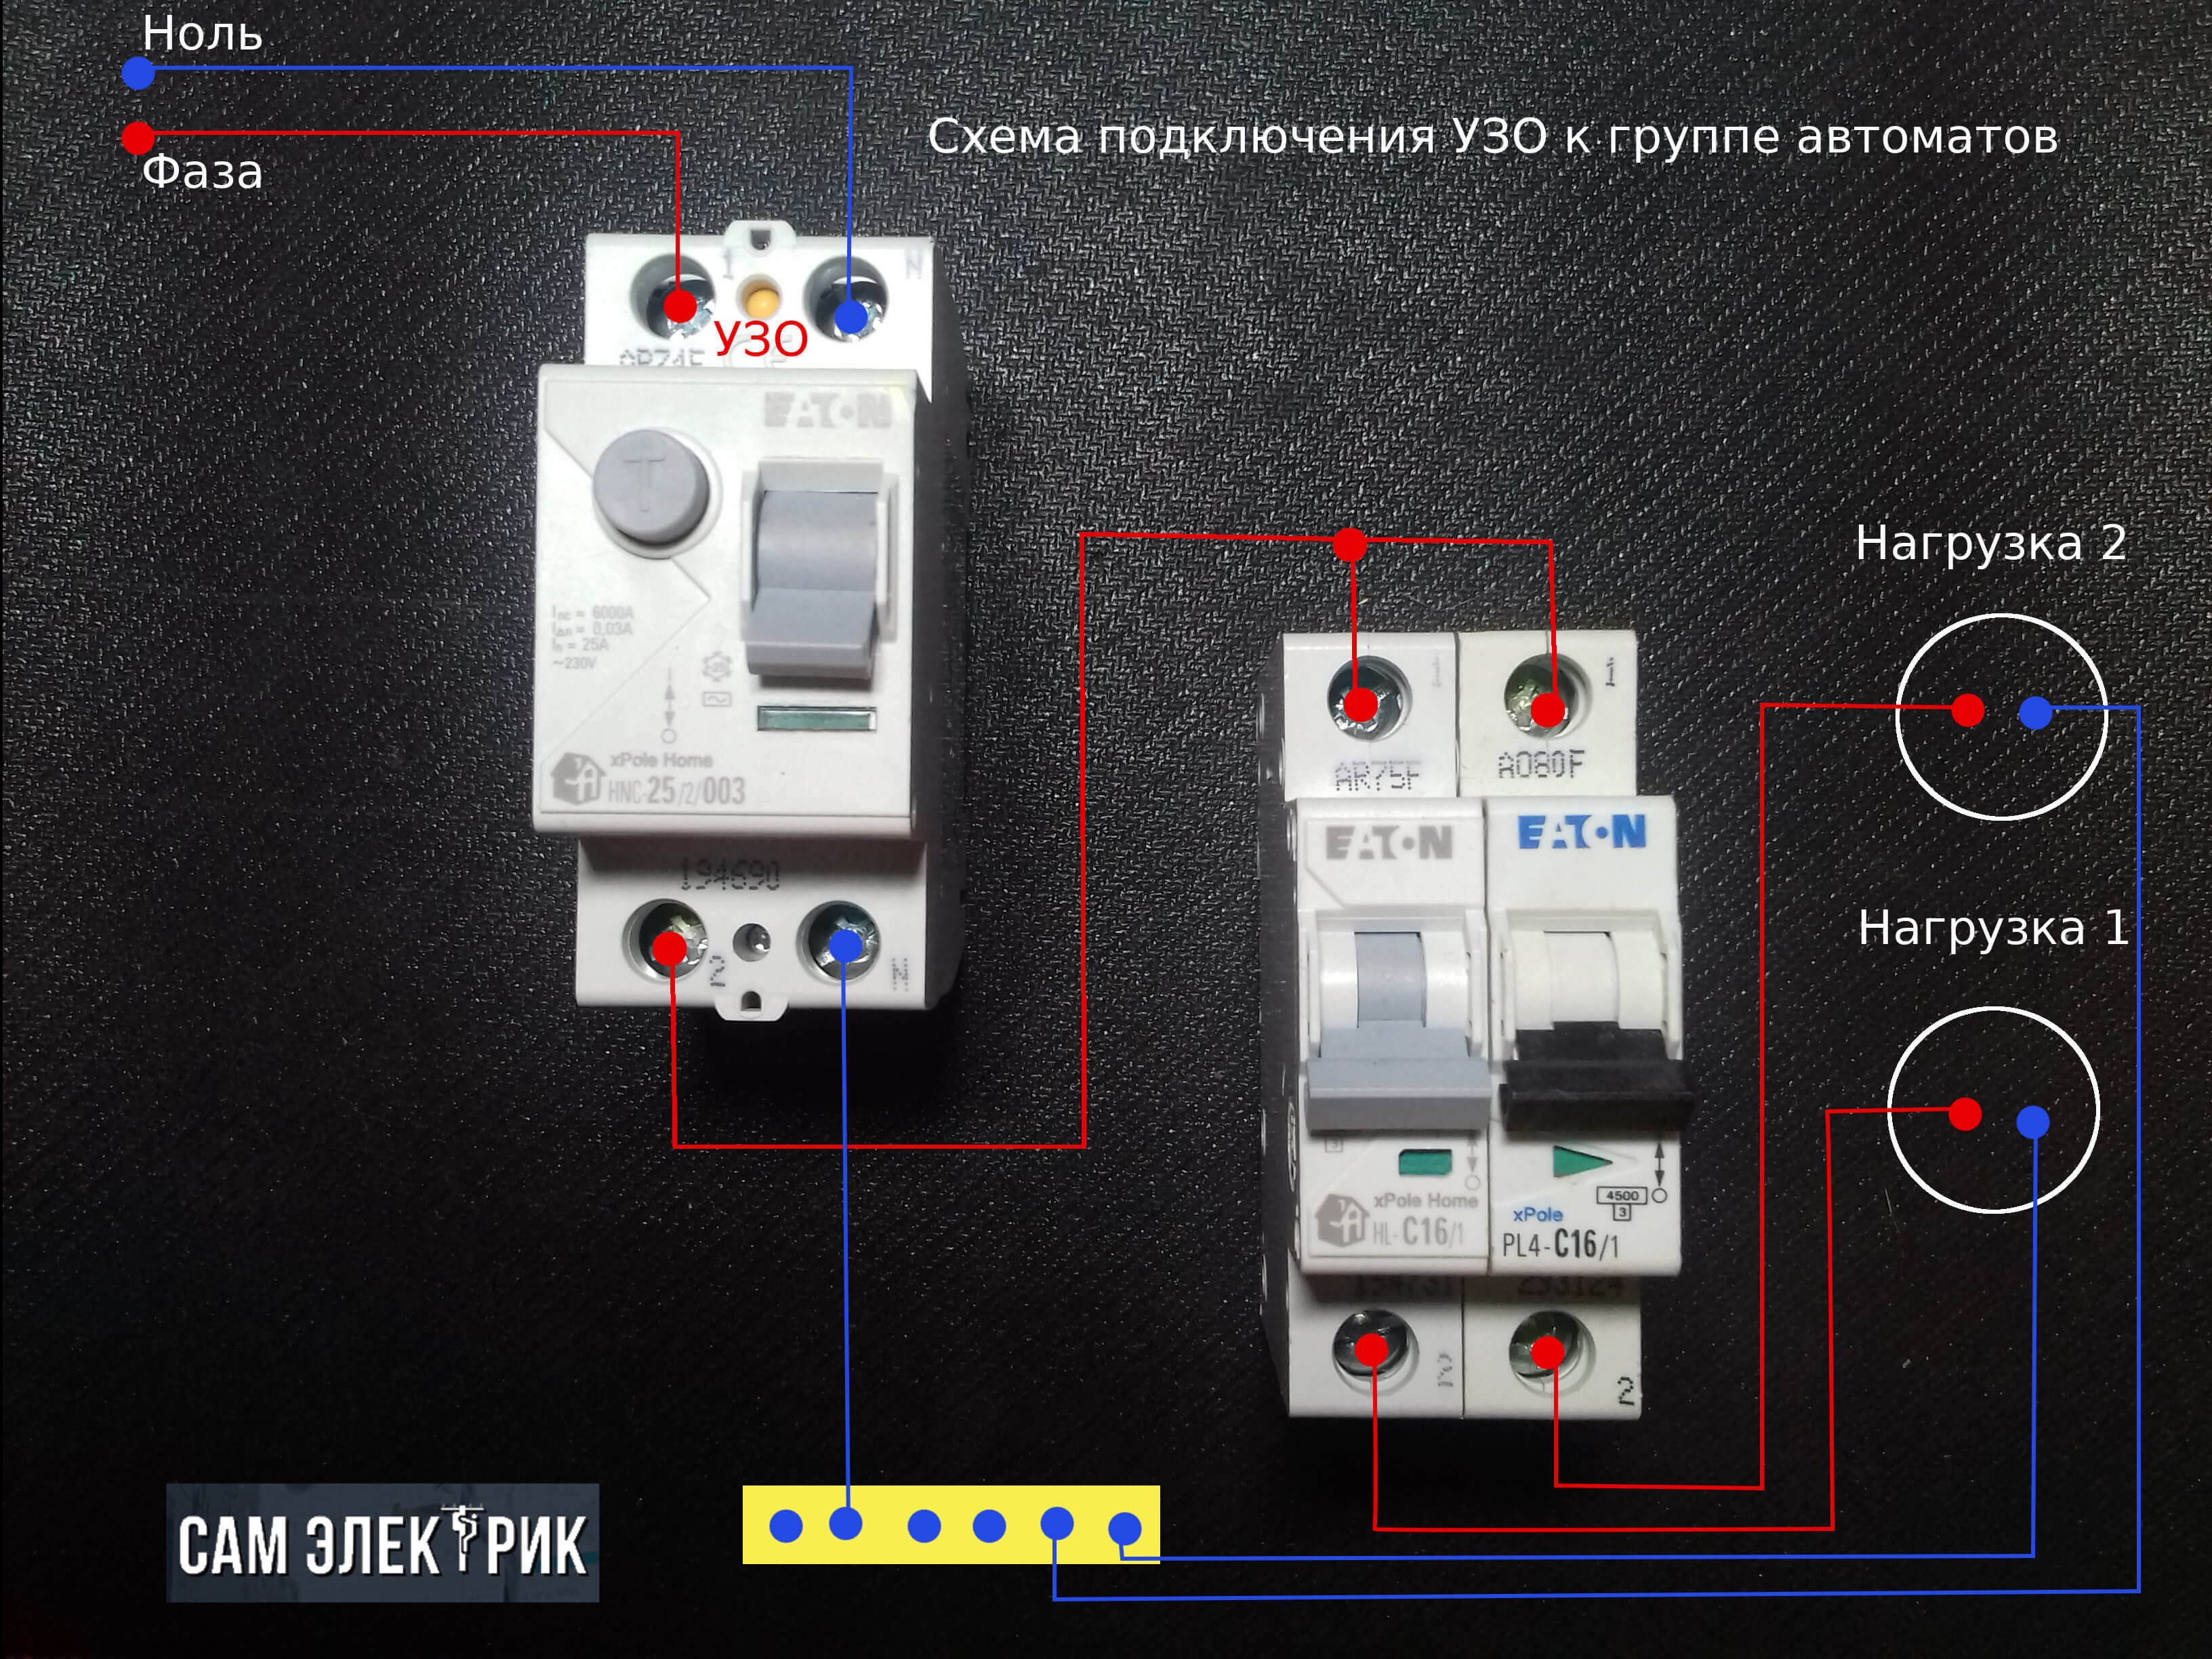 Схема подключения УЗО с автоматами